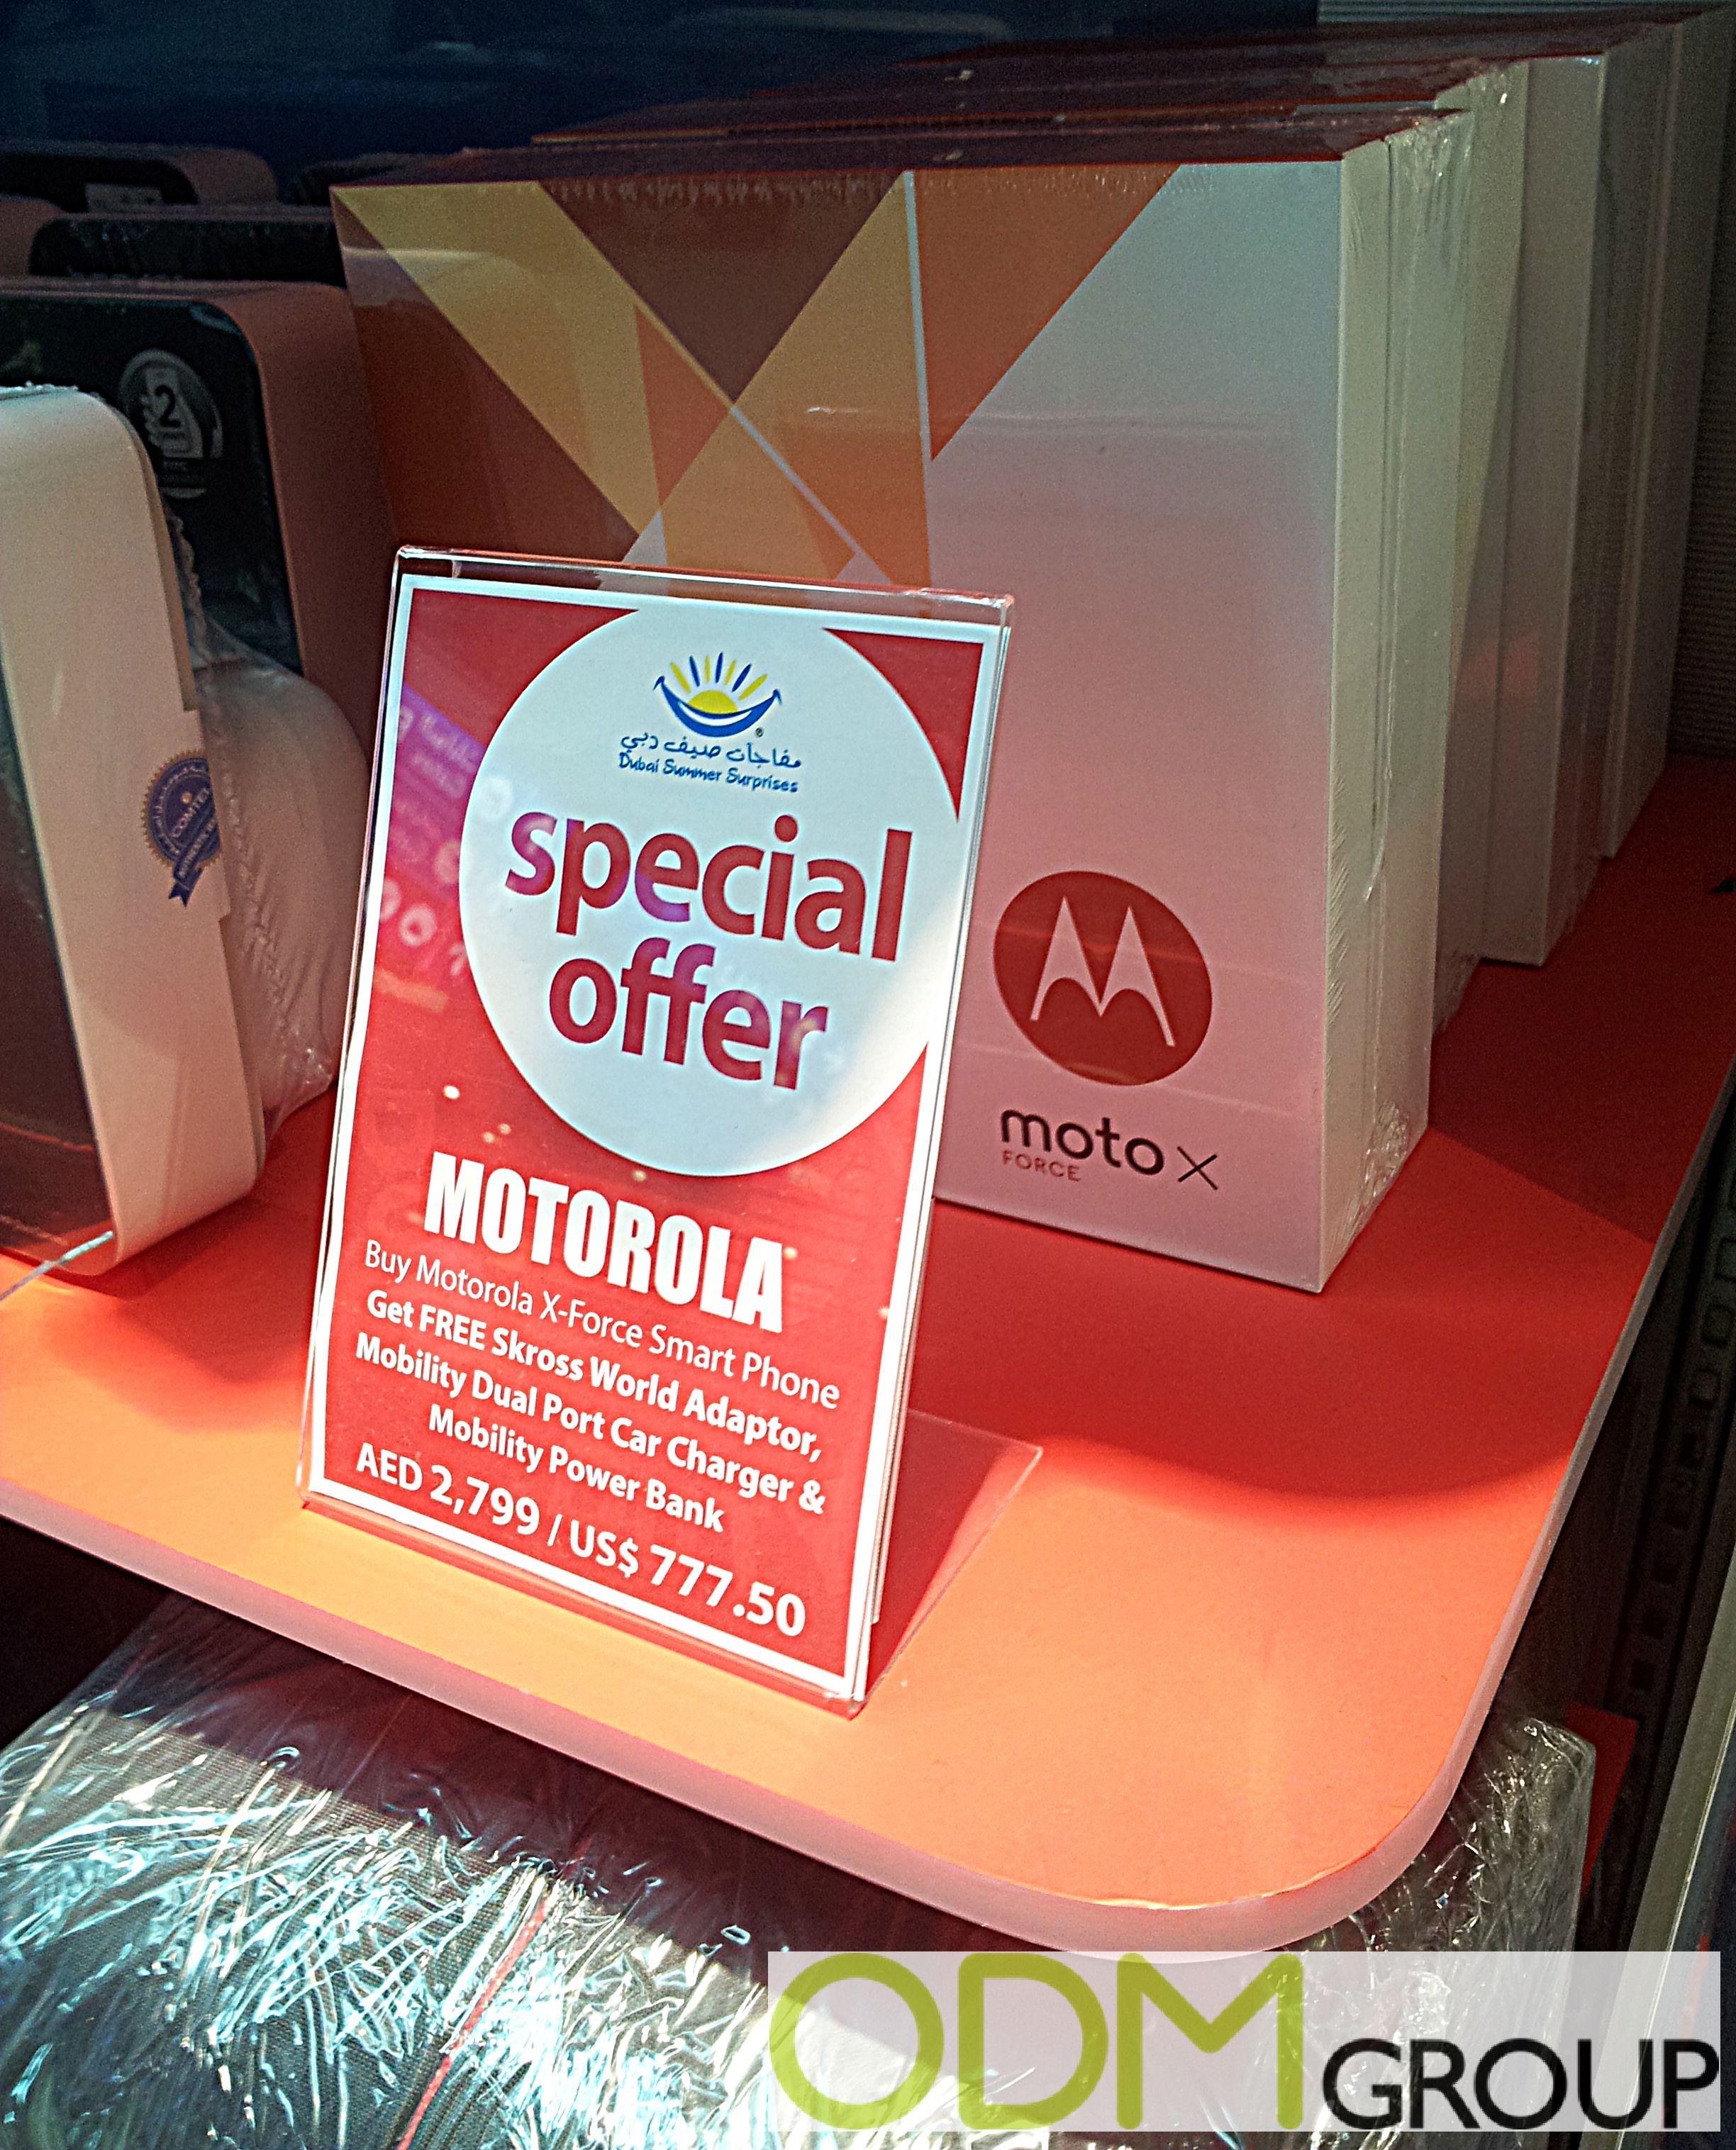 Motorola offers Duty Free Travel Promotion